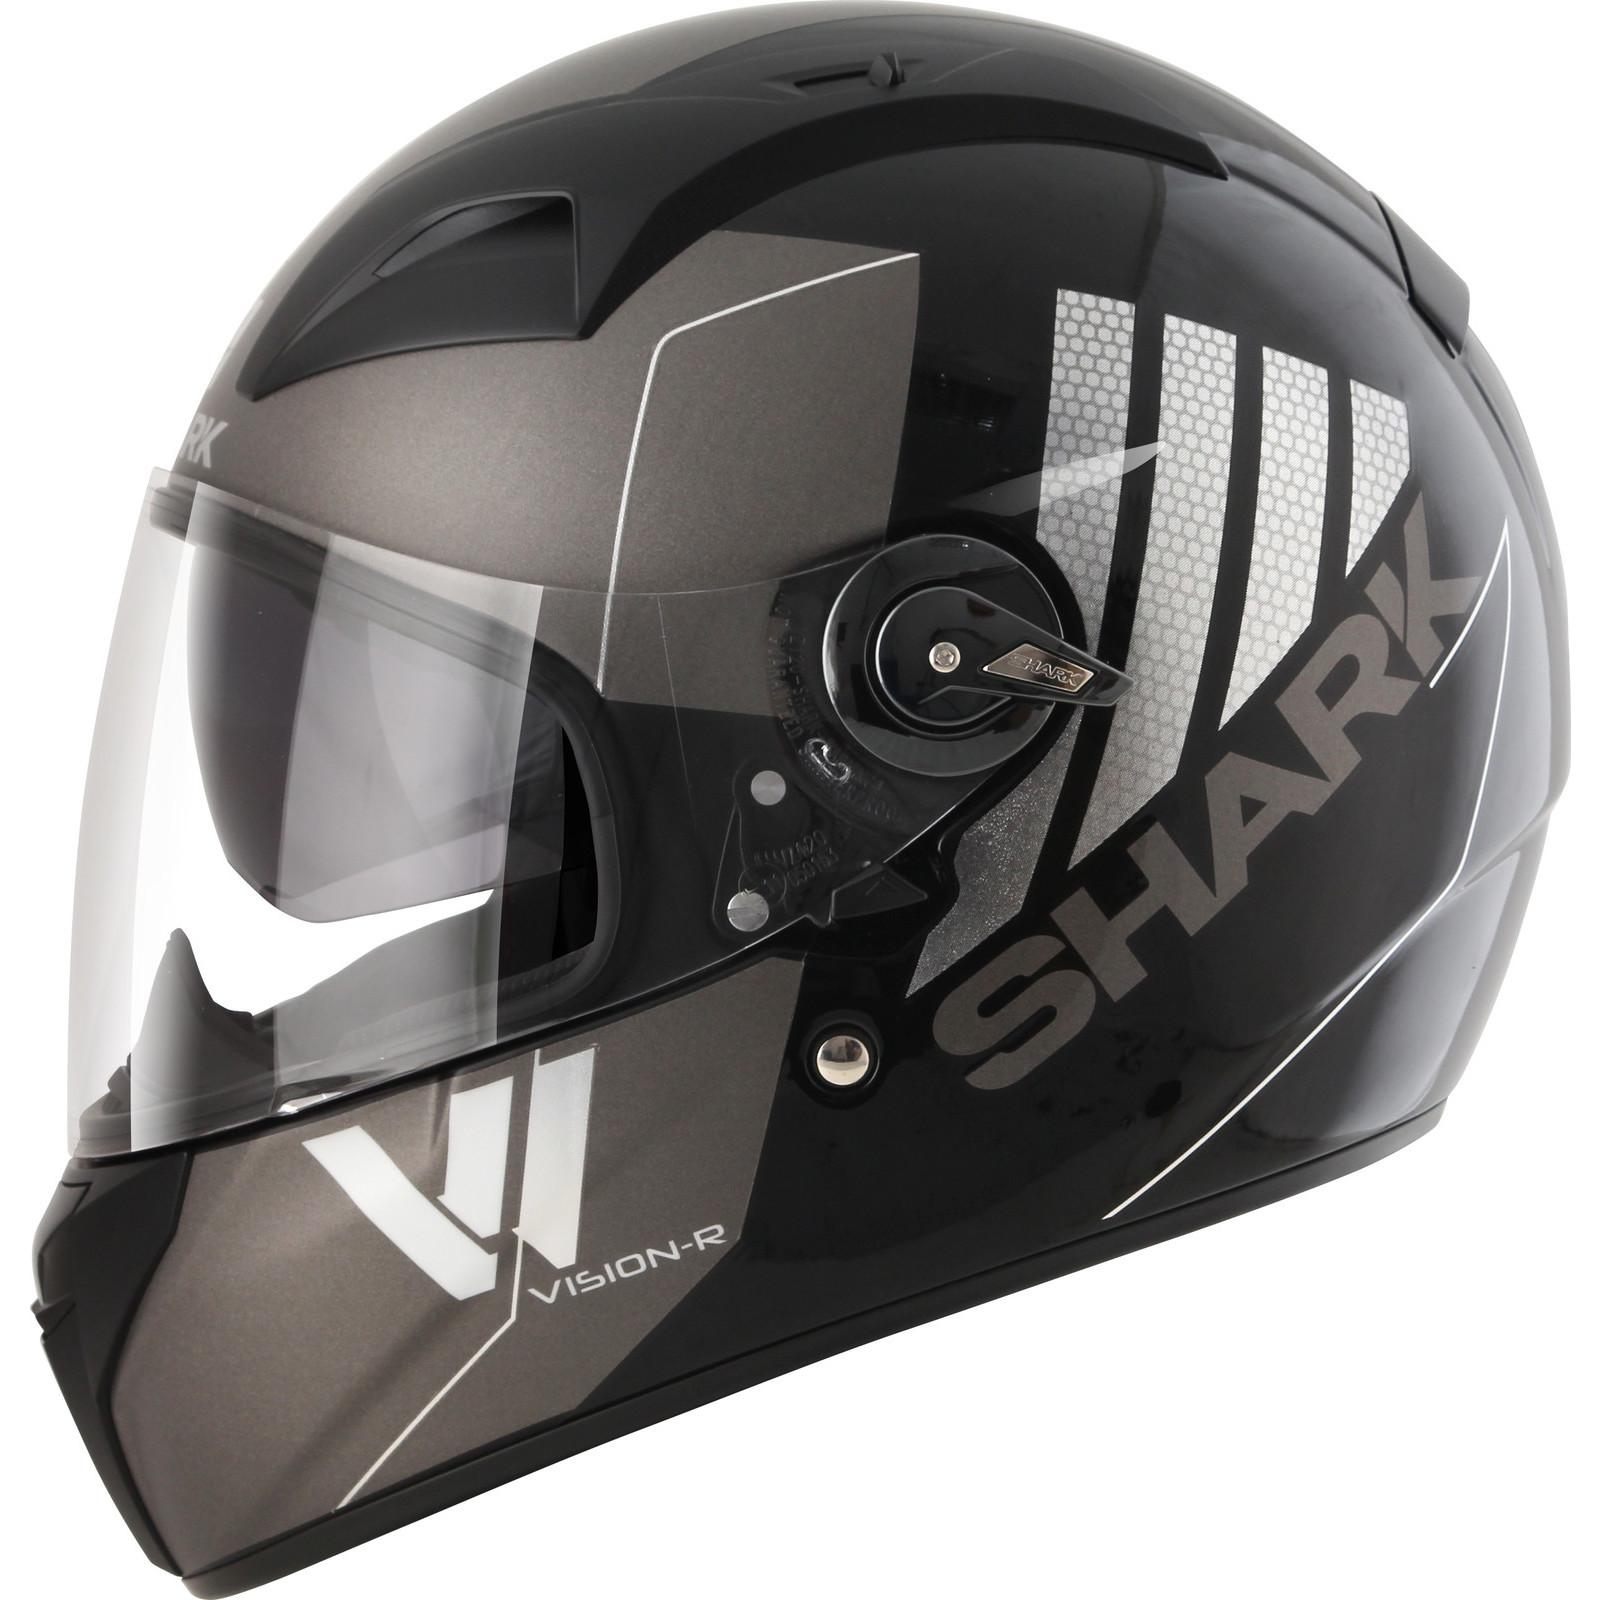 shark vision r series 2 cartney motorbike bike integral full face helmet visor ebay. Black Bedroom Furniture Sets. Home Design Ideas